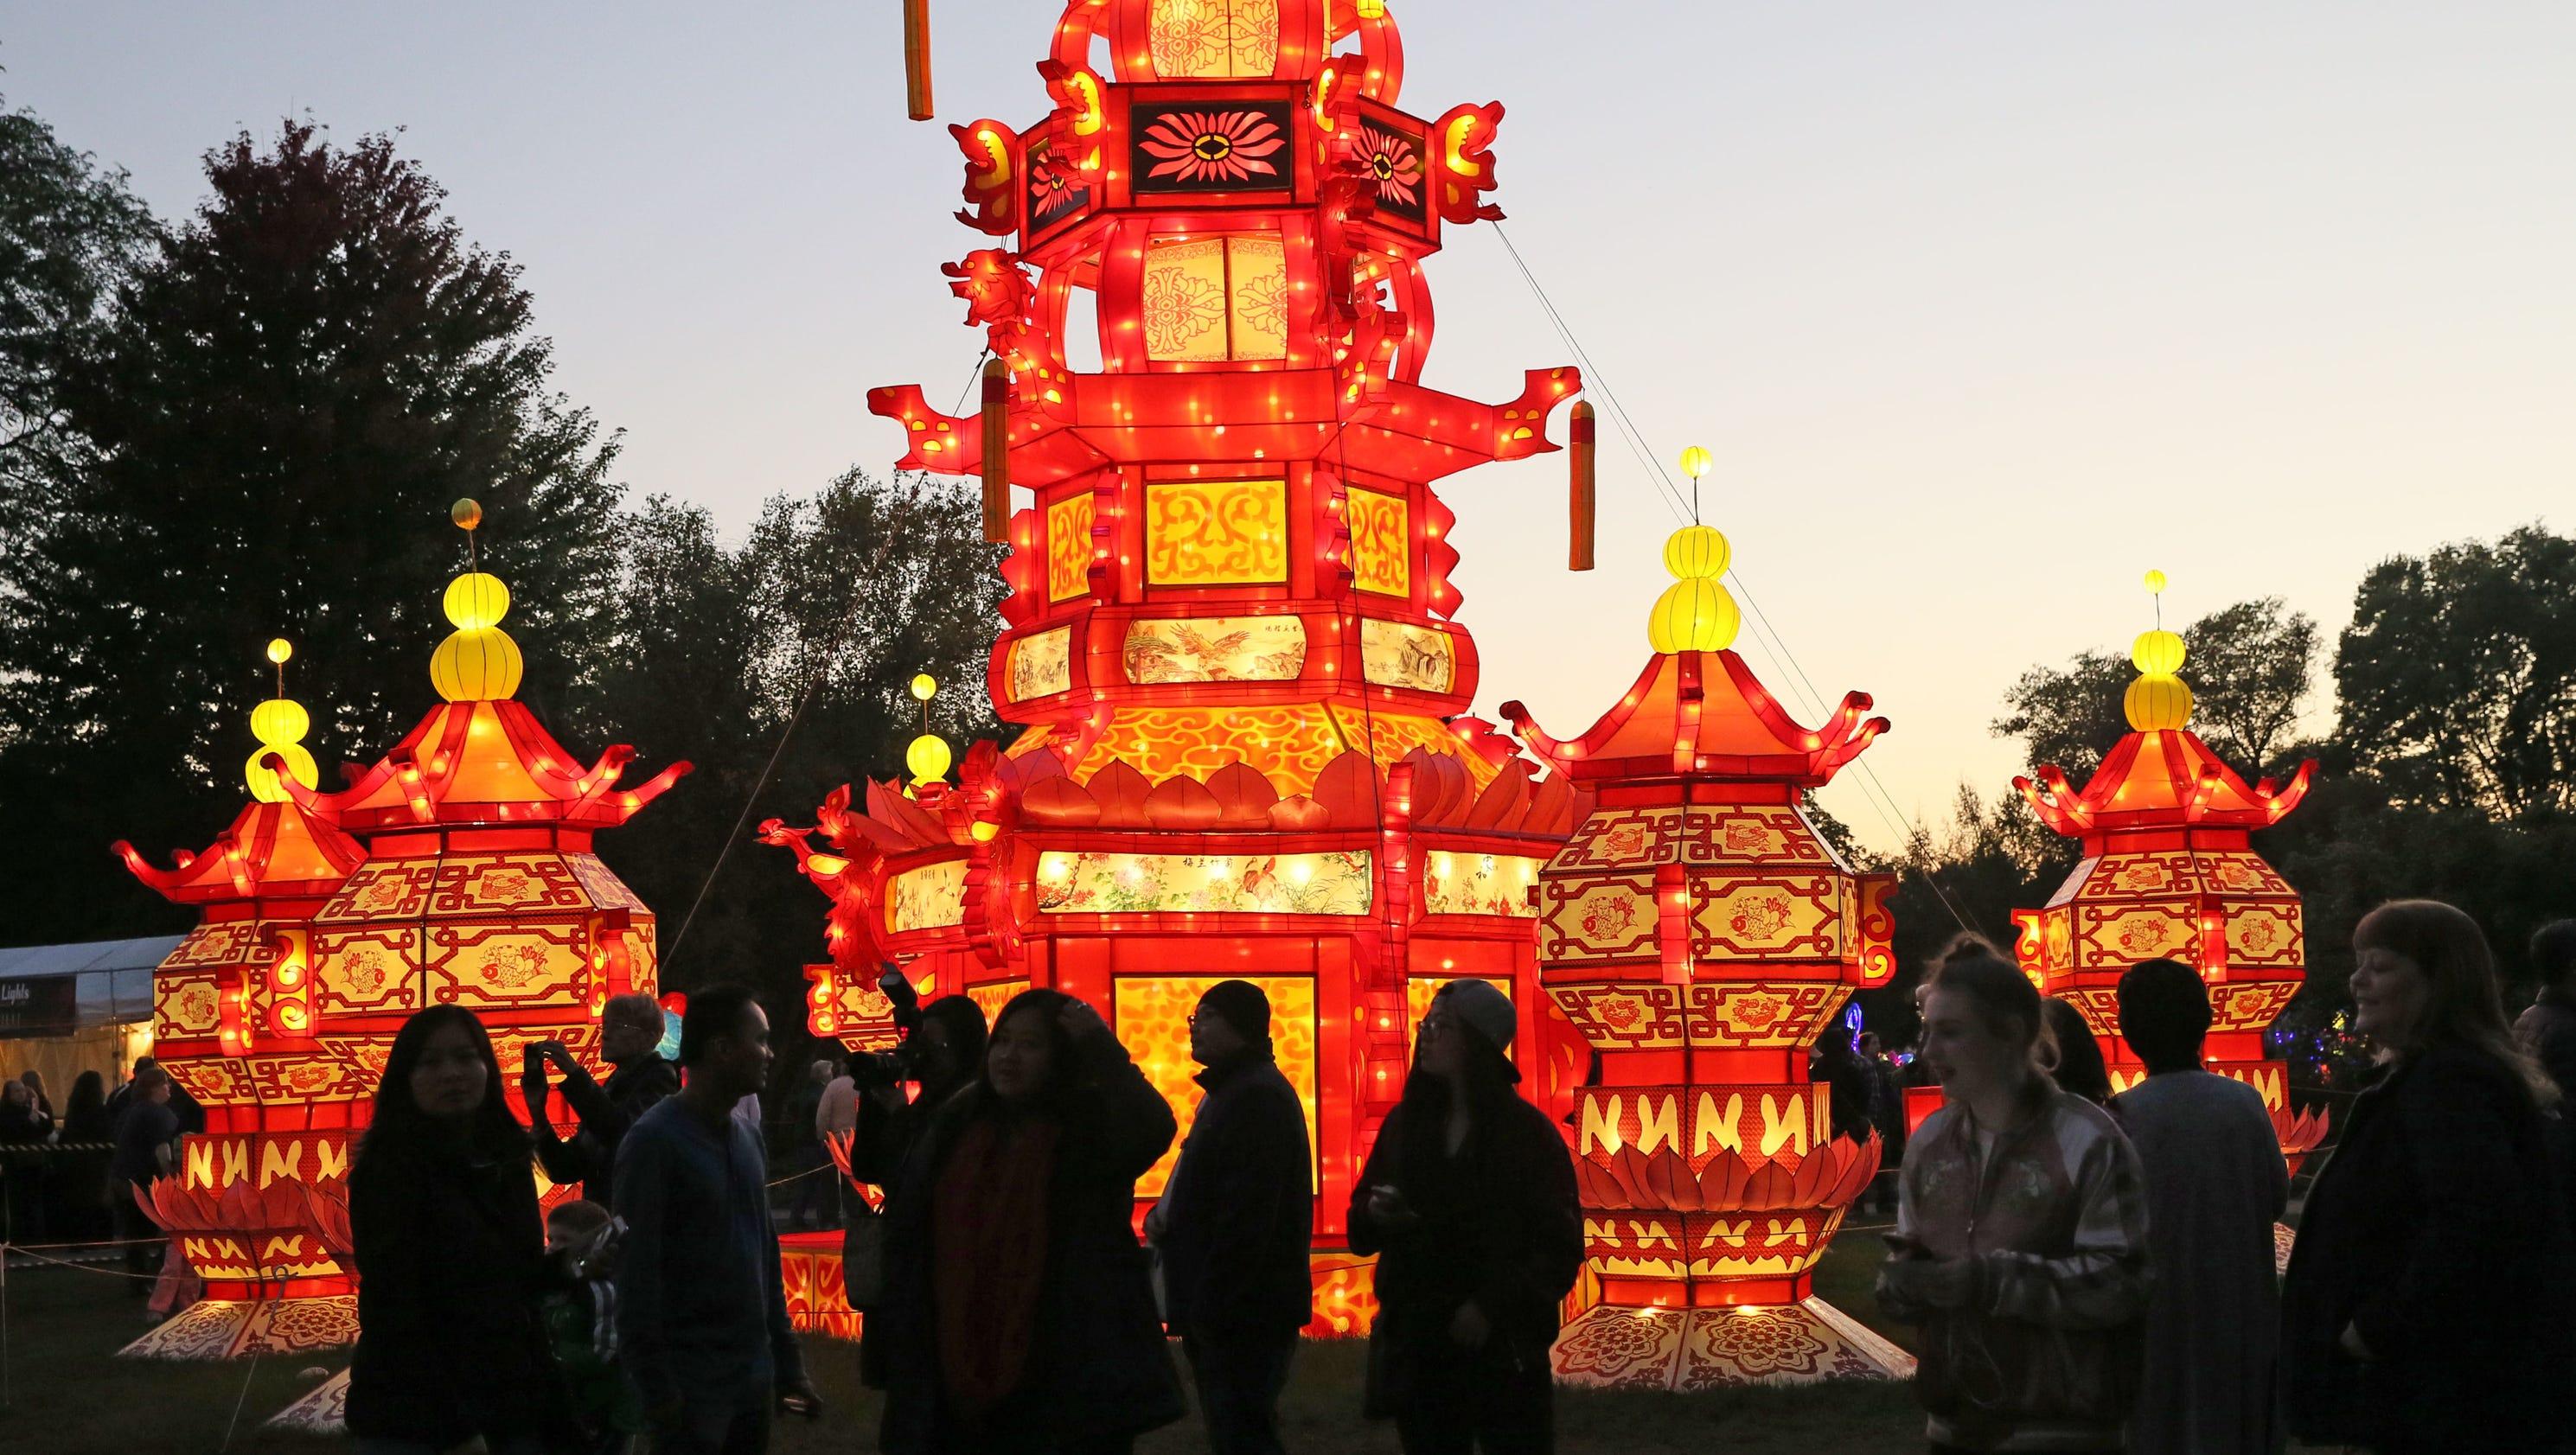 China Lights Display Brightens Boerner Botanical Gardens